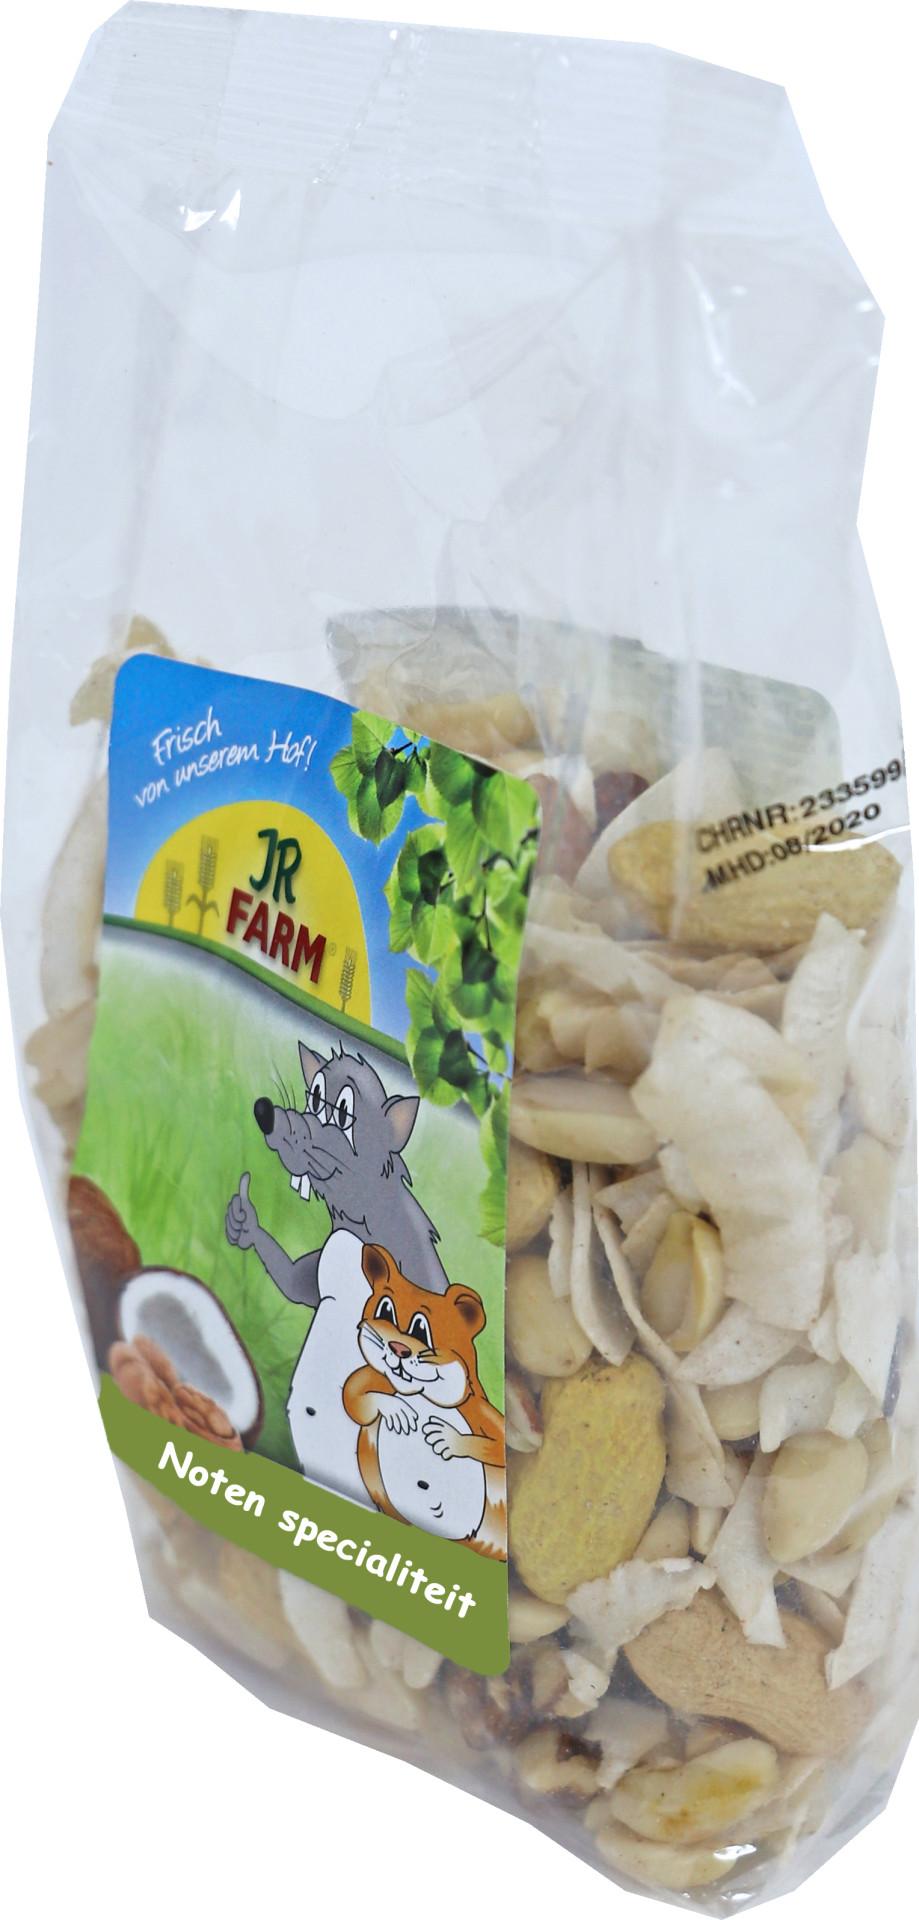 JR Farm notenspecialiteit 200 gr